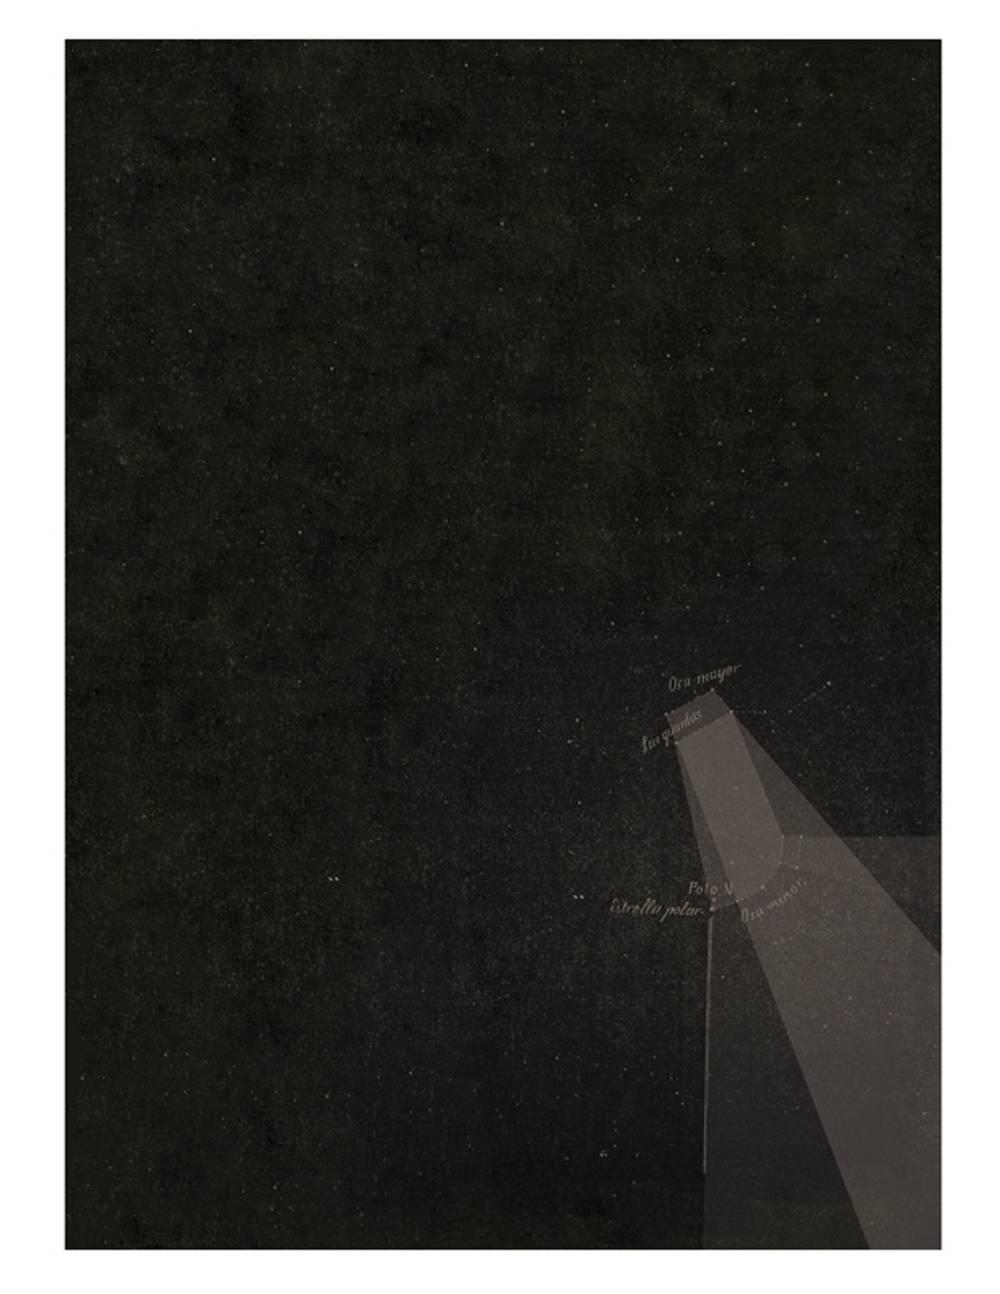 Ficción Astronómica 3